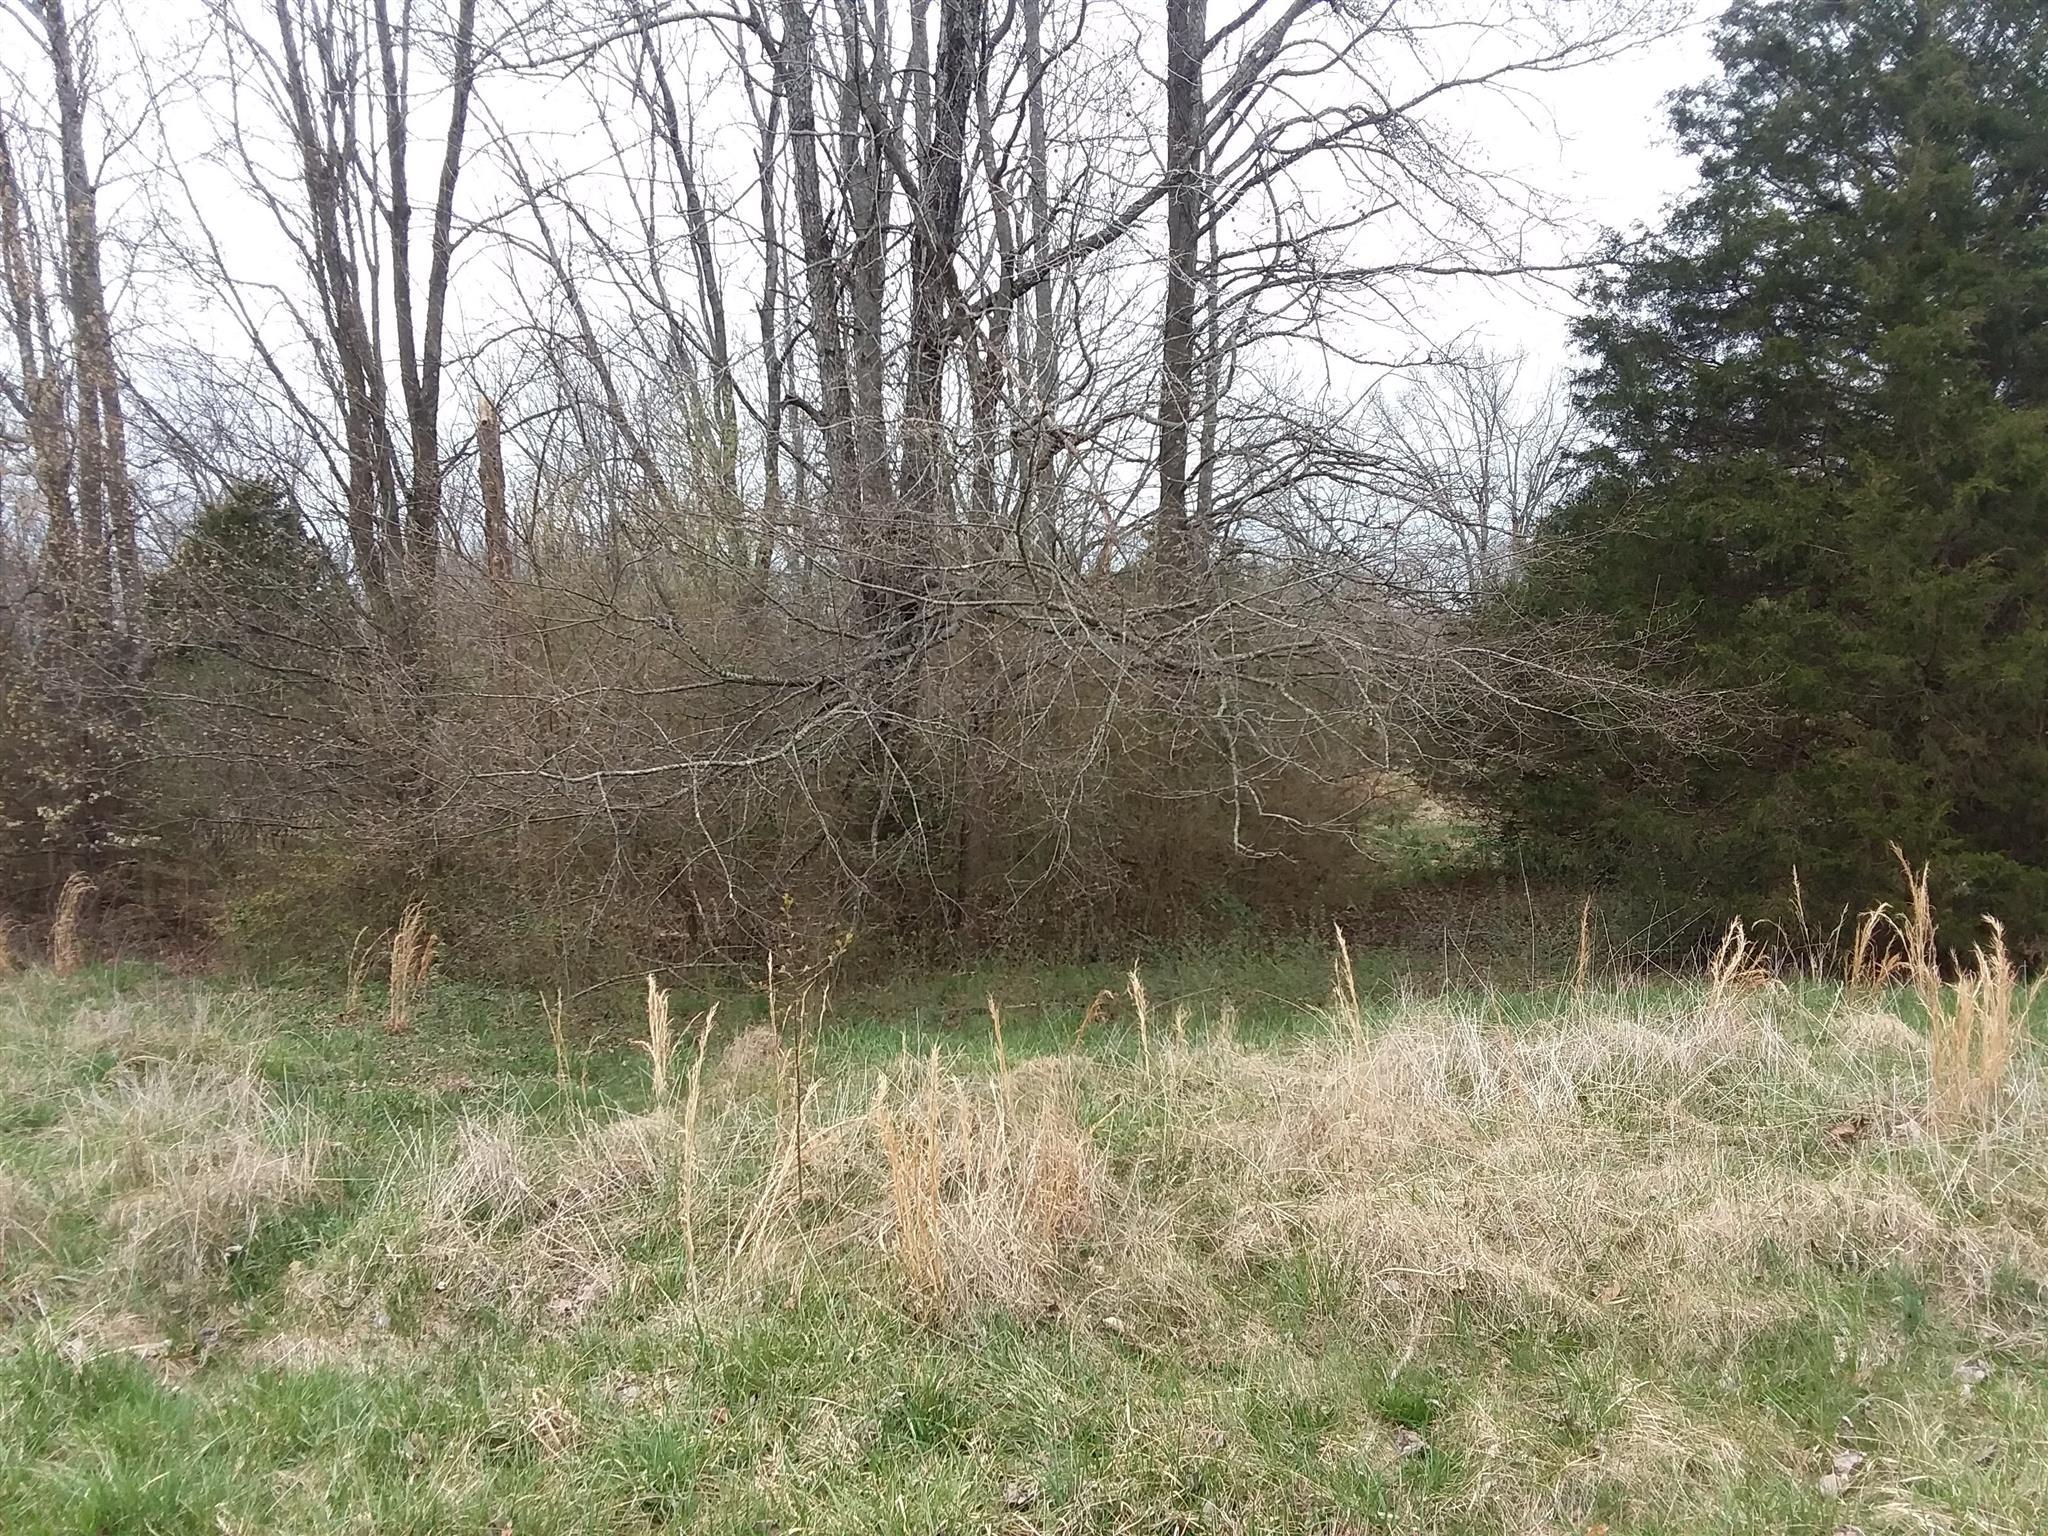 0 Stacy Ave, Lawrenceburg, TN 38464 - Lawrenceburg, TN real estate listing